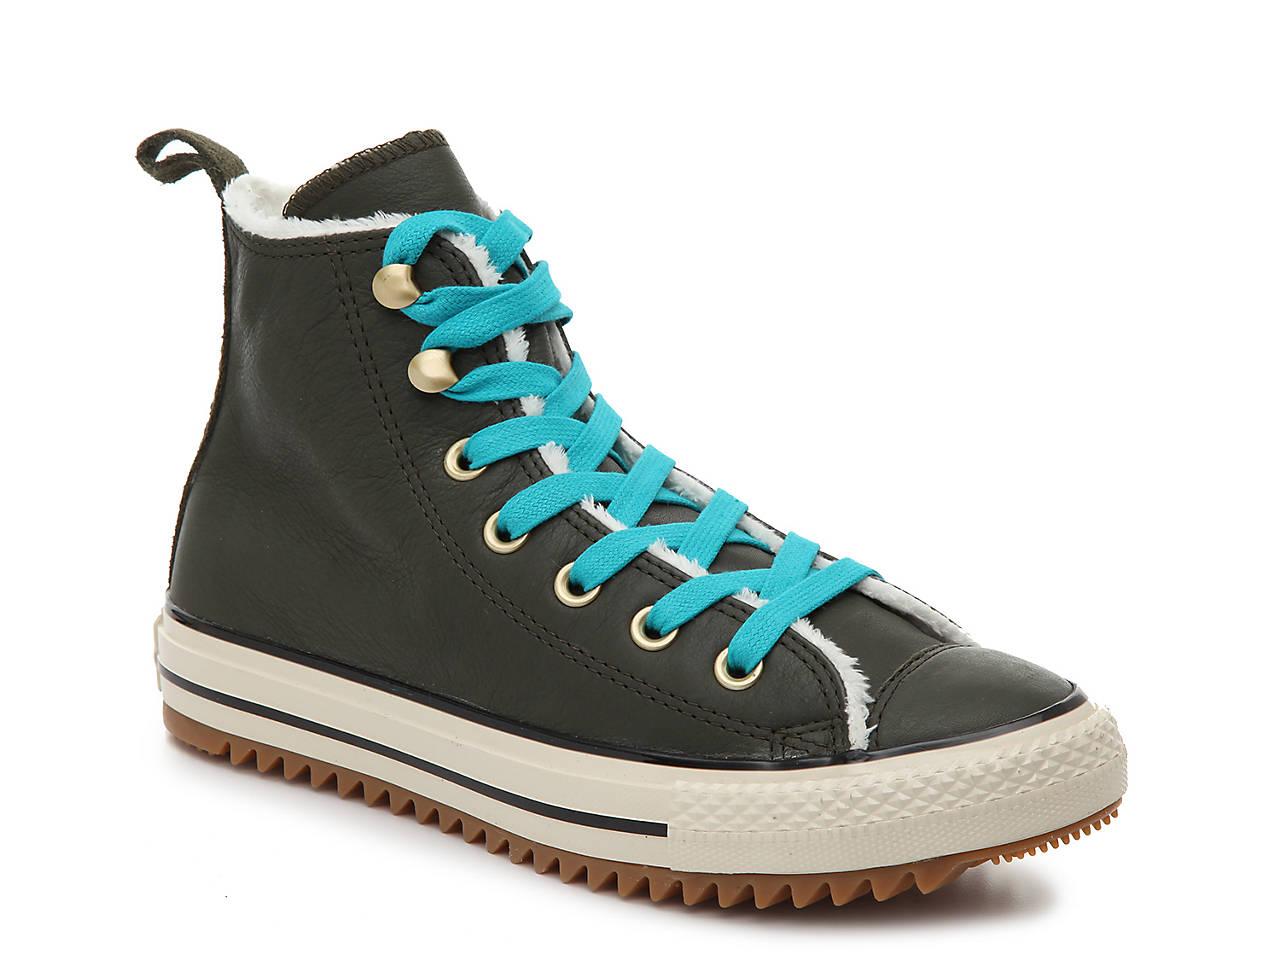 2b4bbbd6366 Chuck Taylor All Star Hi High-Top Sneaker - Women s. Athletic Converse  Converse Chuck Taylor All ...